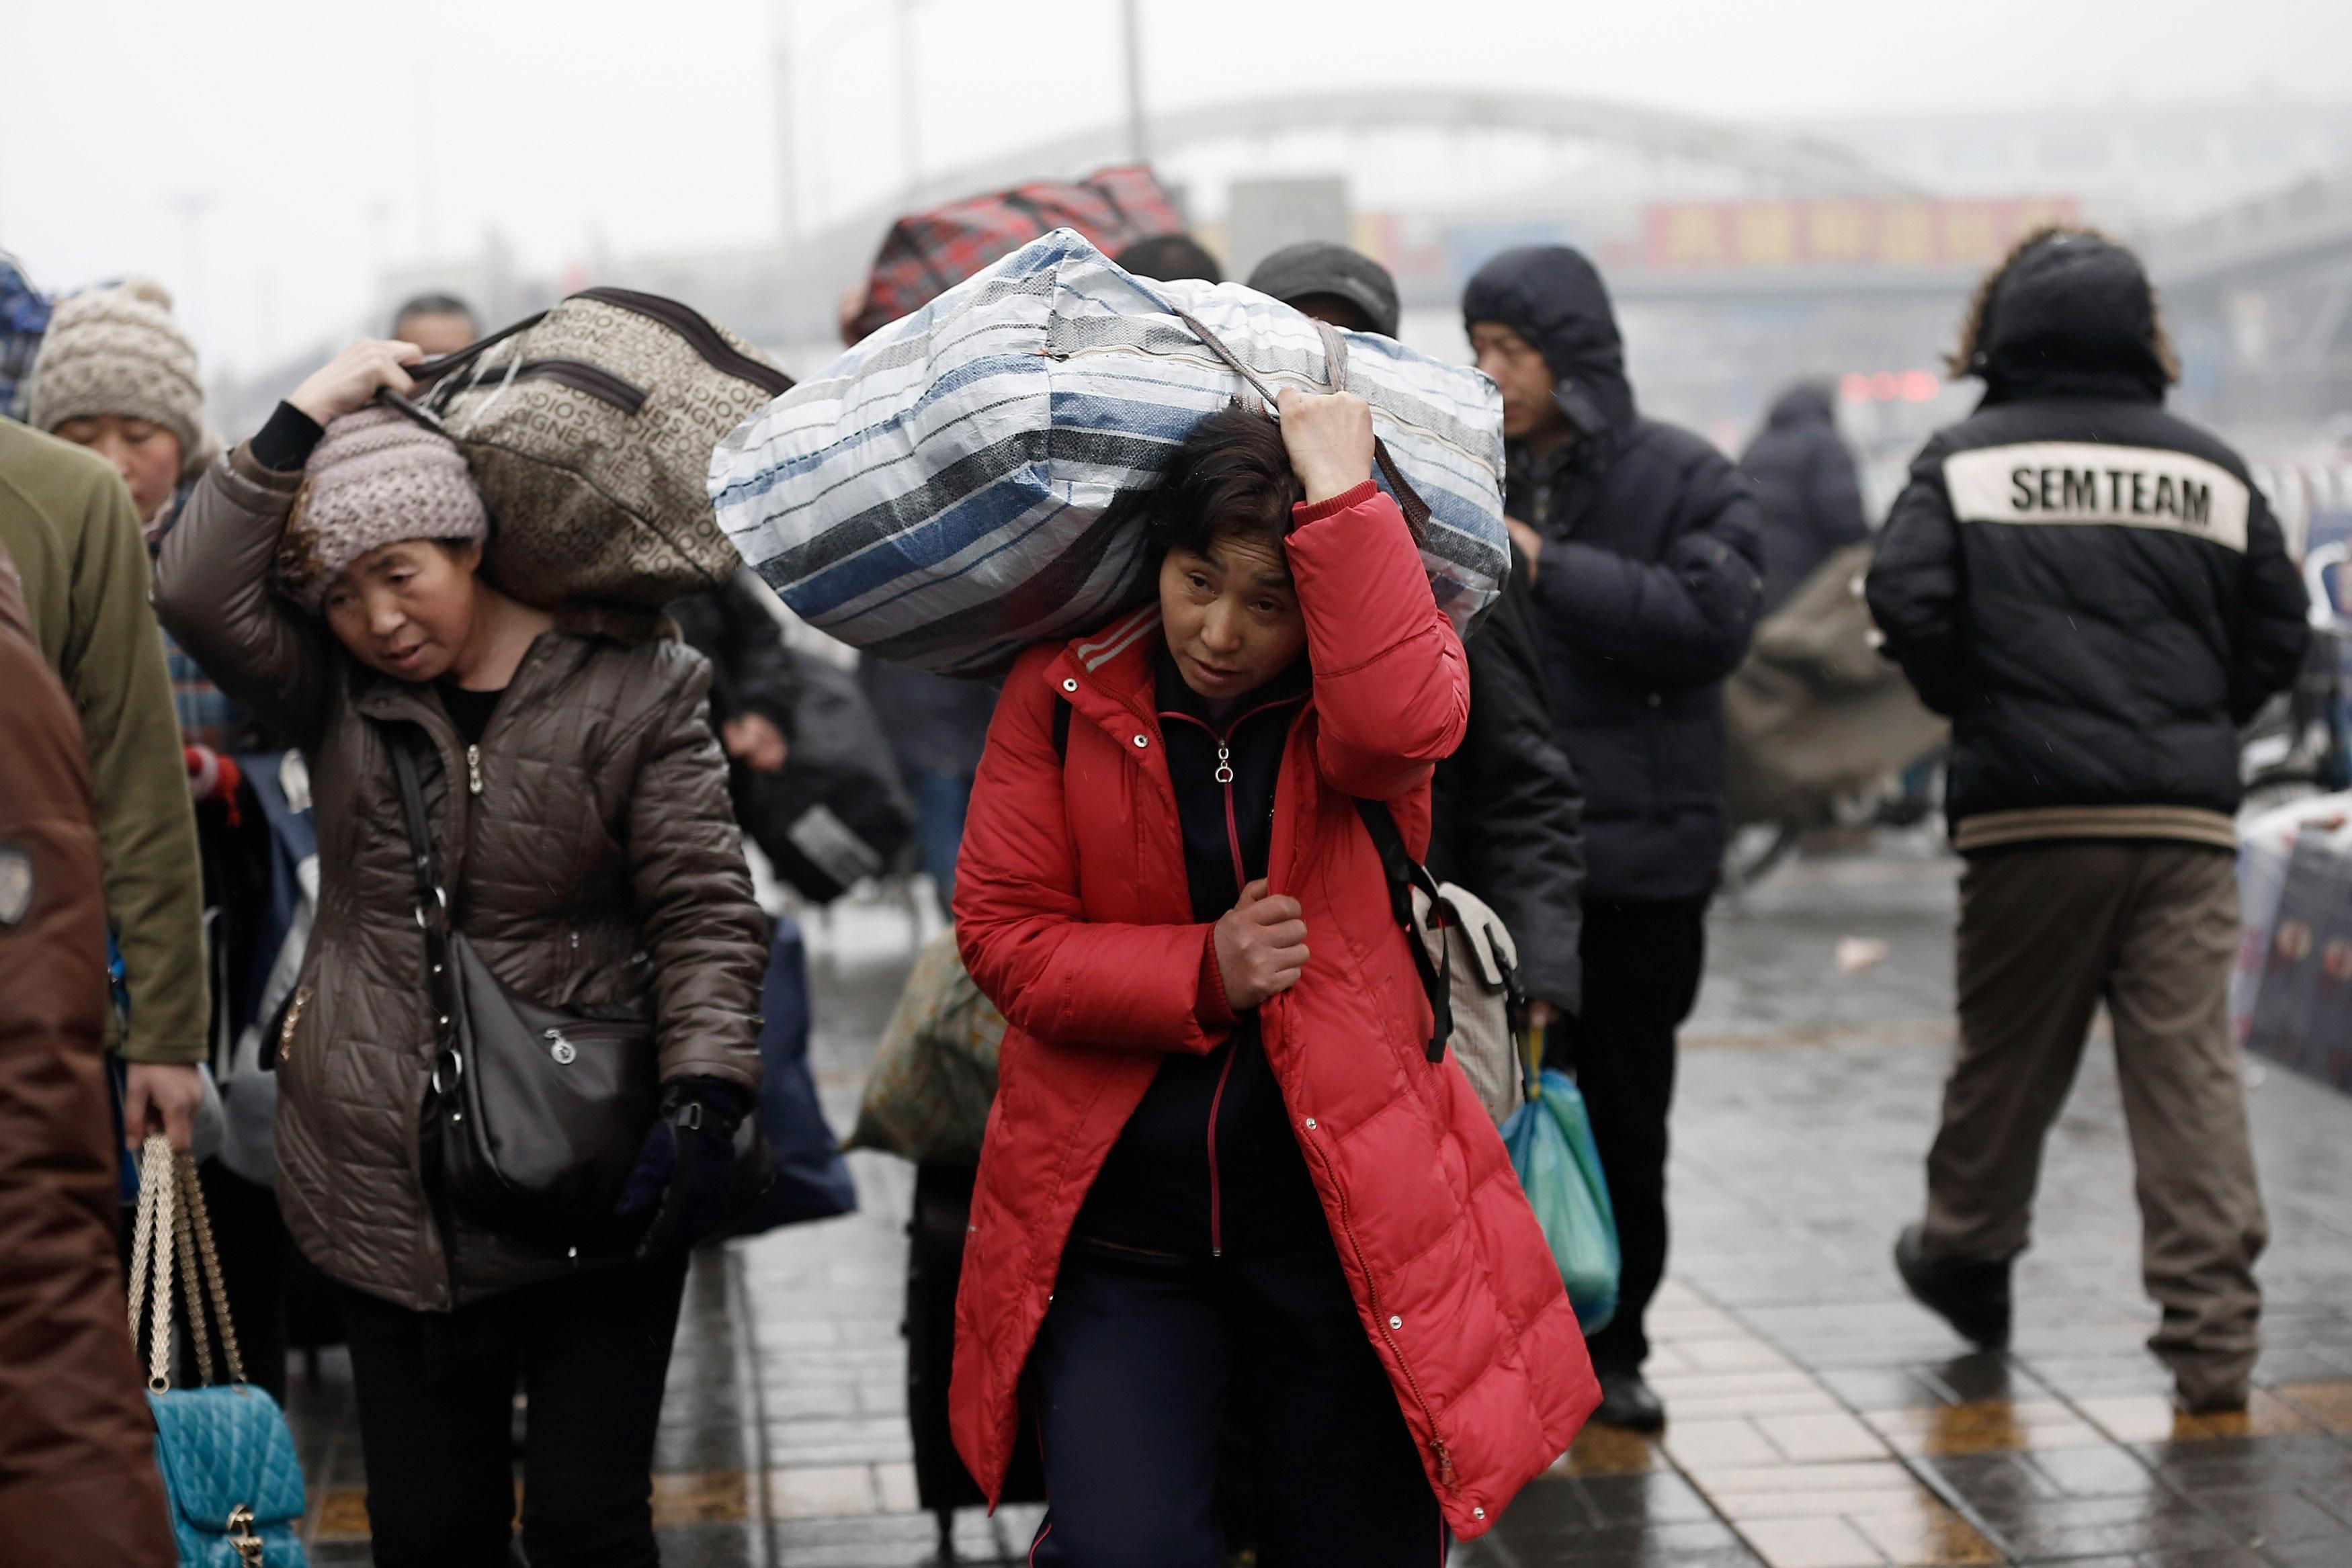 Abandoned Children and China's Socio-Economic Apartheid